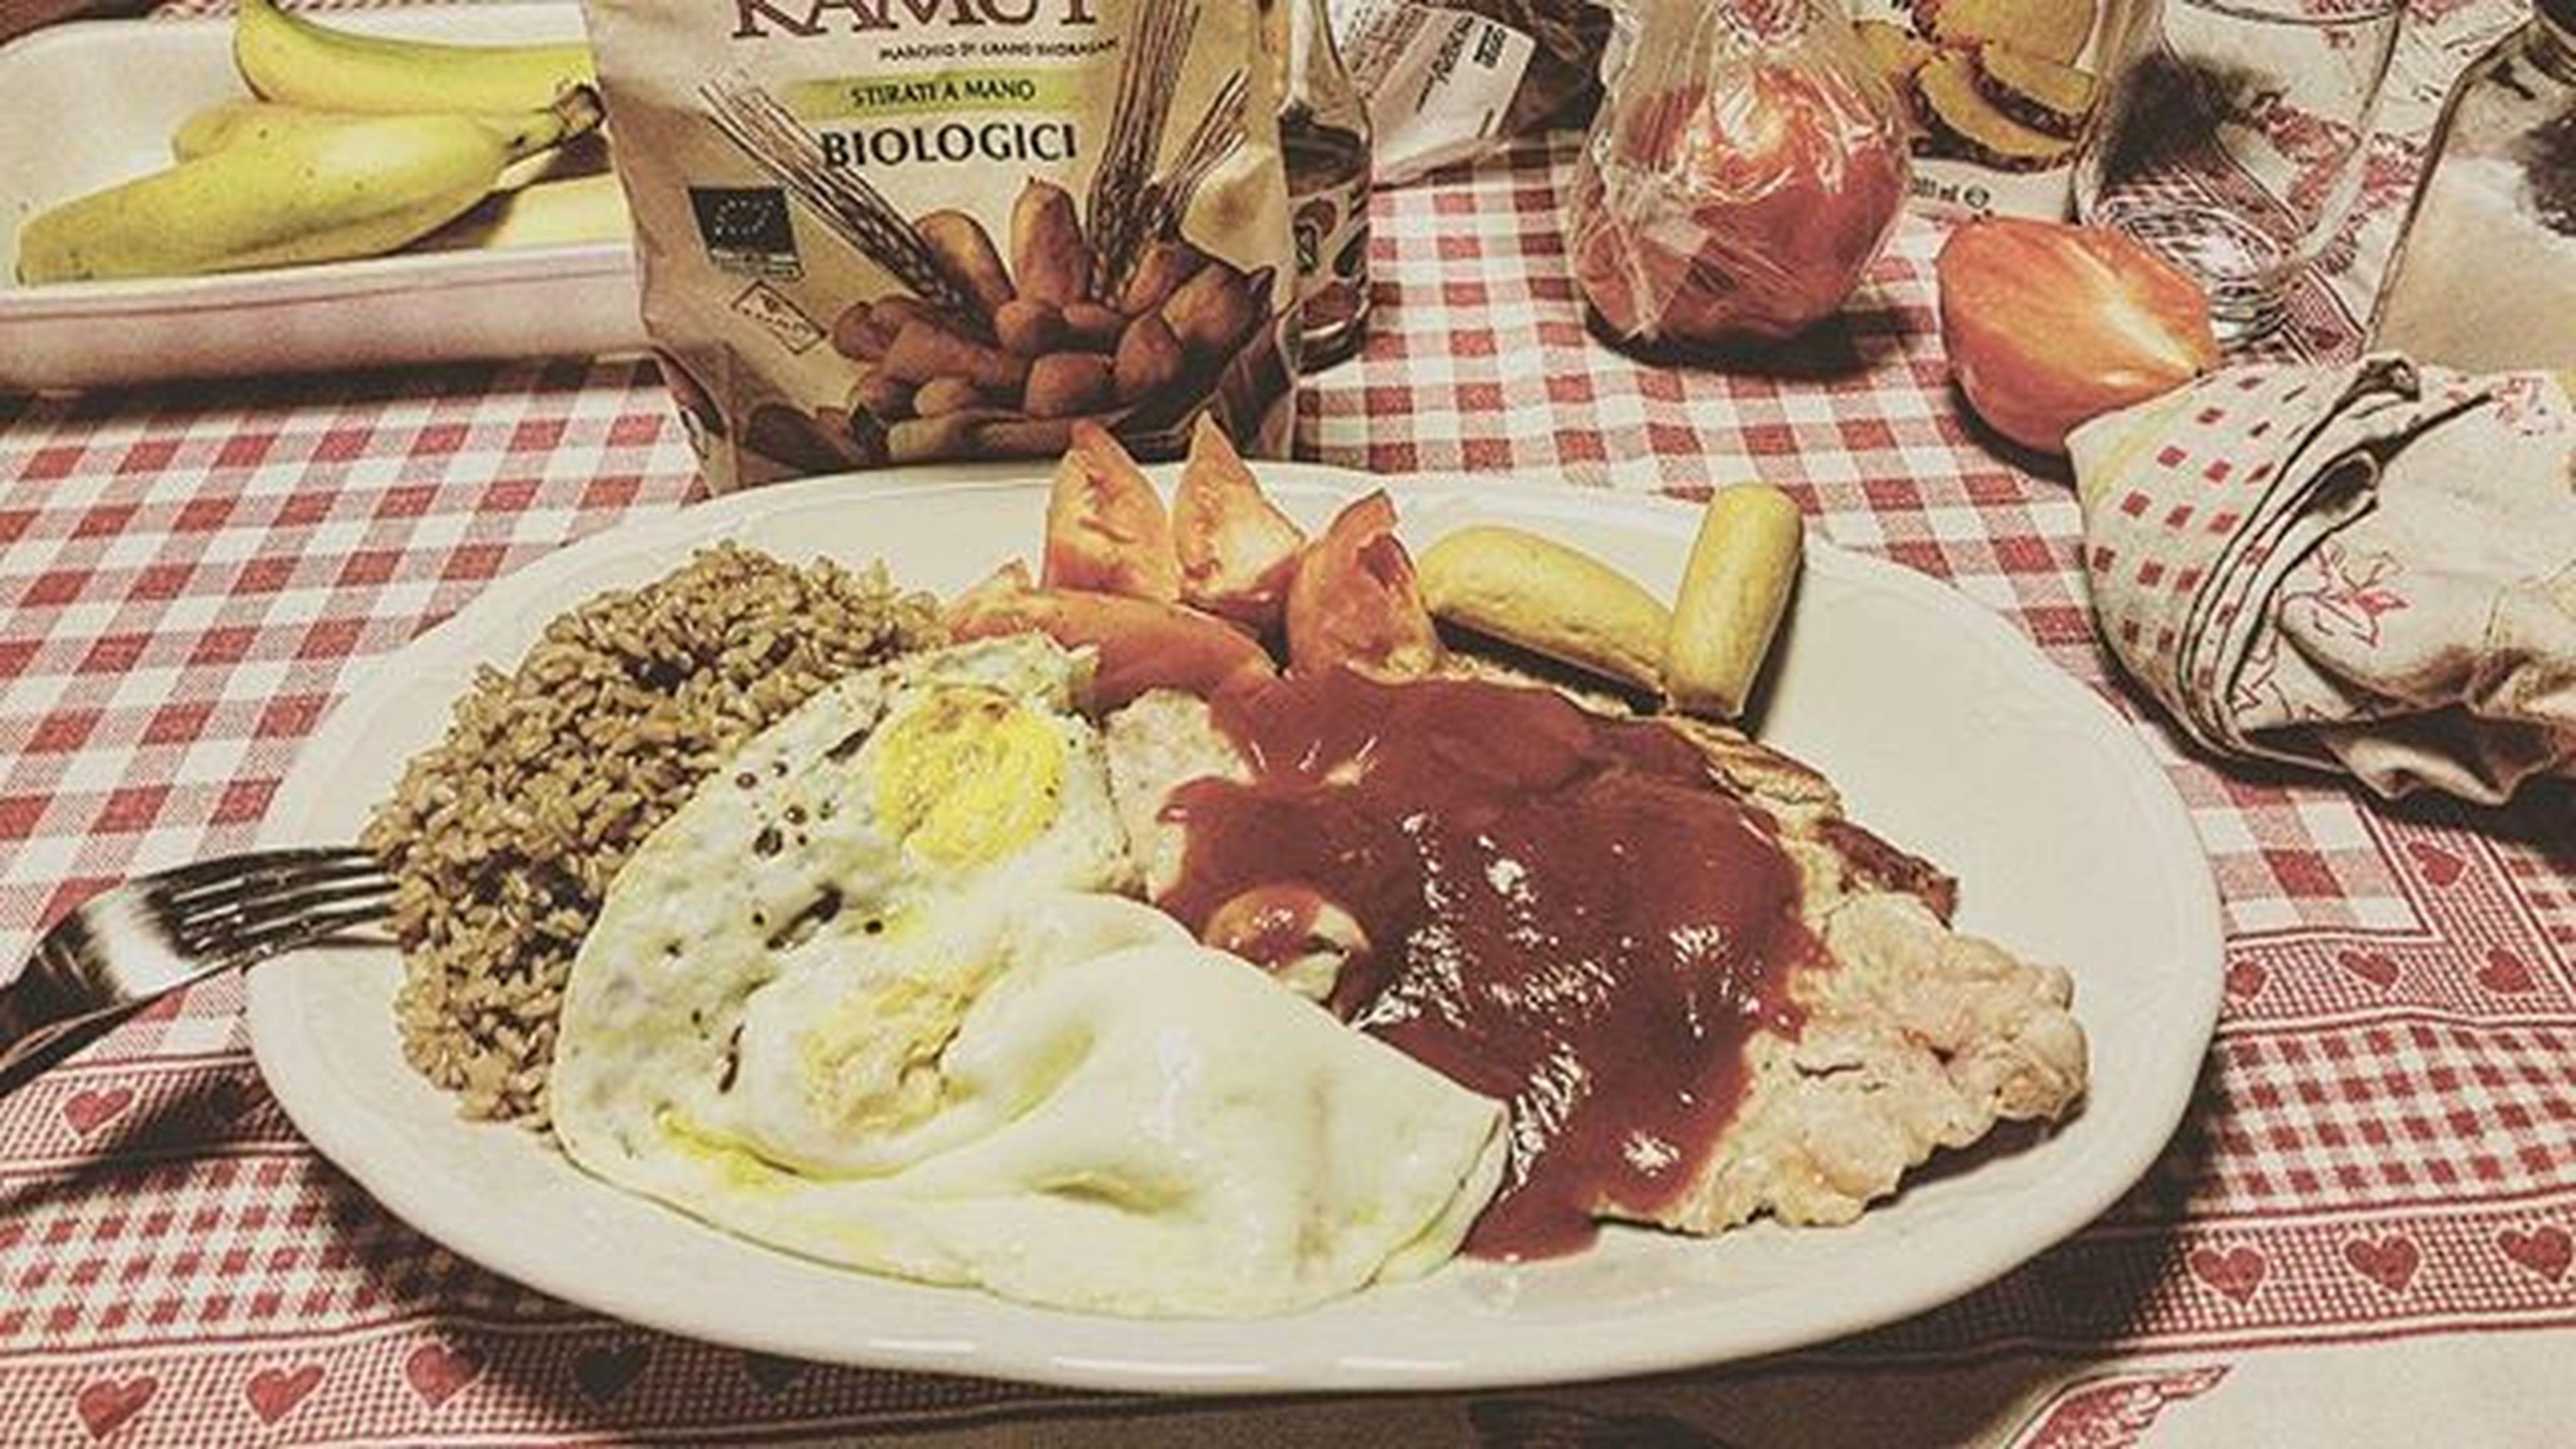 Food Foodporn Egg Chicken Brownrice KAMUT Fitness Chef Healthy Love Altrochemasterchef Cenadelle21 .40 Foodisfuel Protein Healthyfood